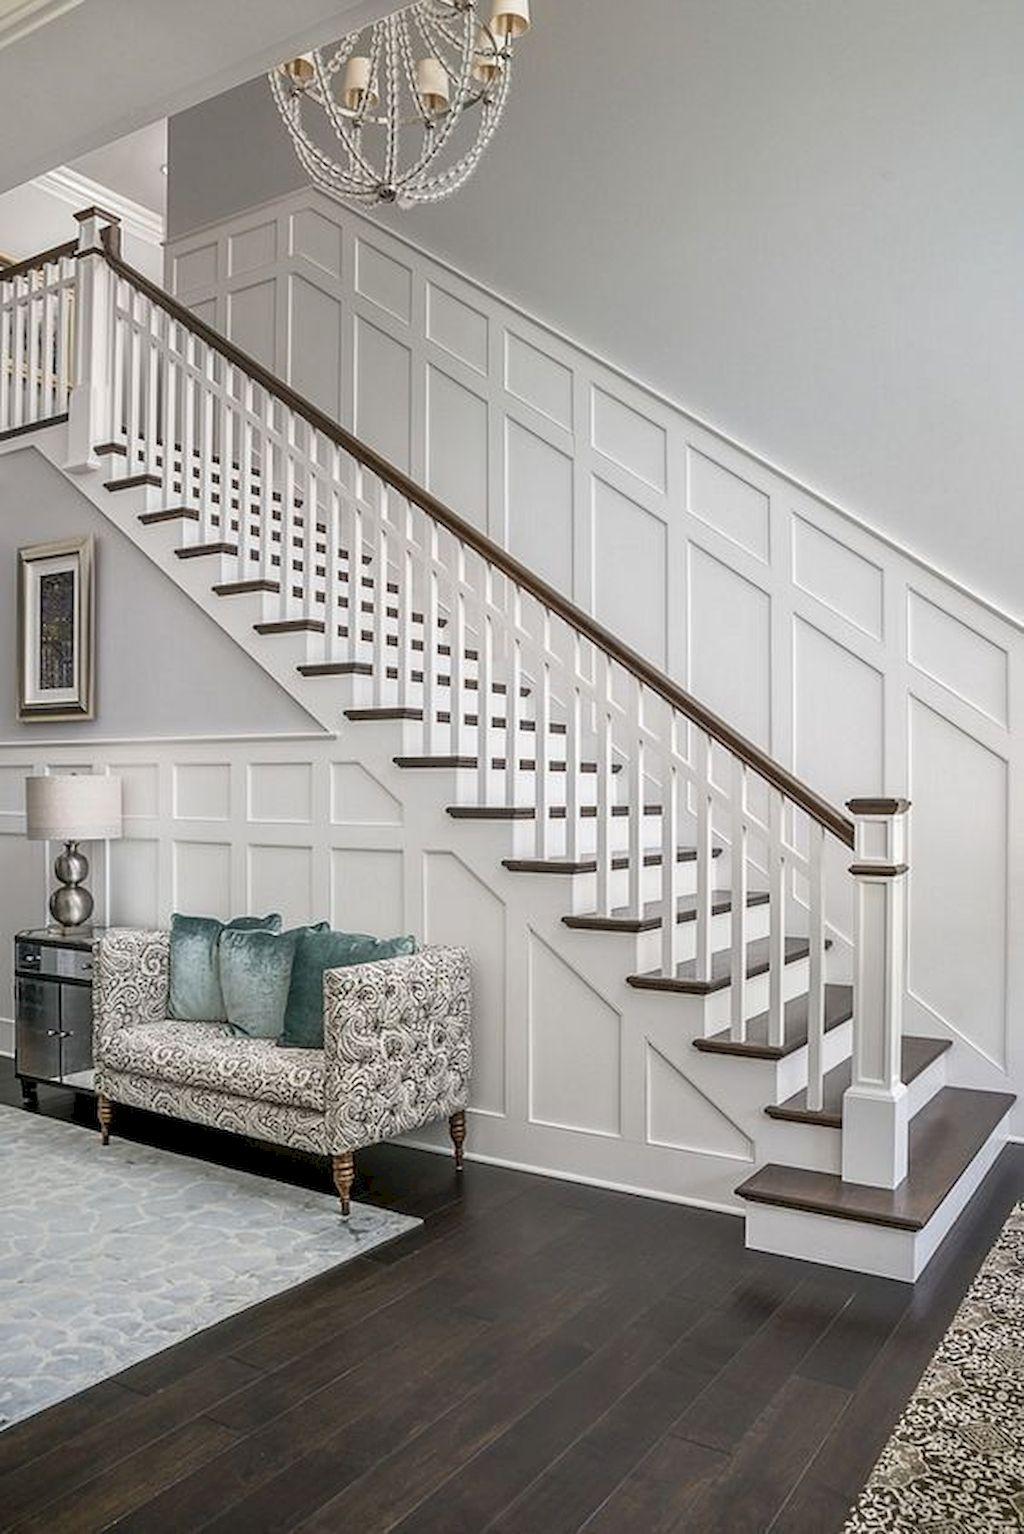 Staircase Railing179